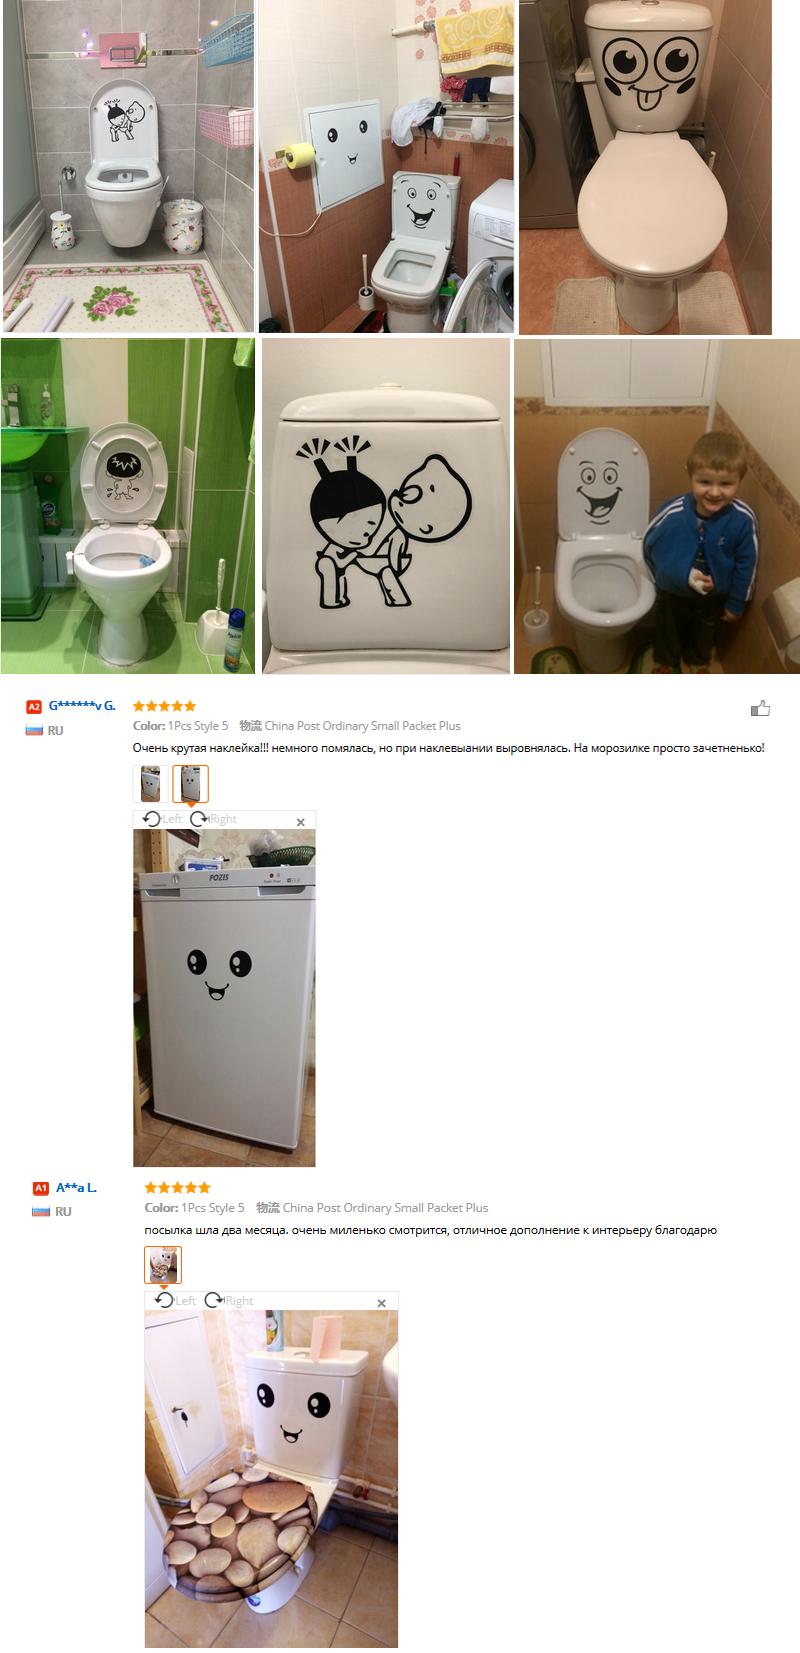 HTB1ysGNSXXXXXX3apXXq6xXFXXXM - 1pcs Bathroom Wall Stickers Toilet Home Decoration Waterproof Wall Decals For Toilet Sticker Decorative Paste Home Decor